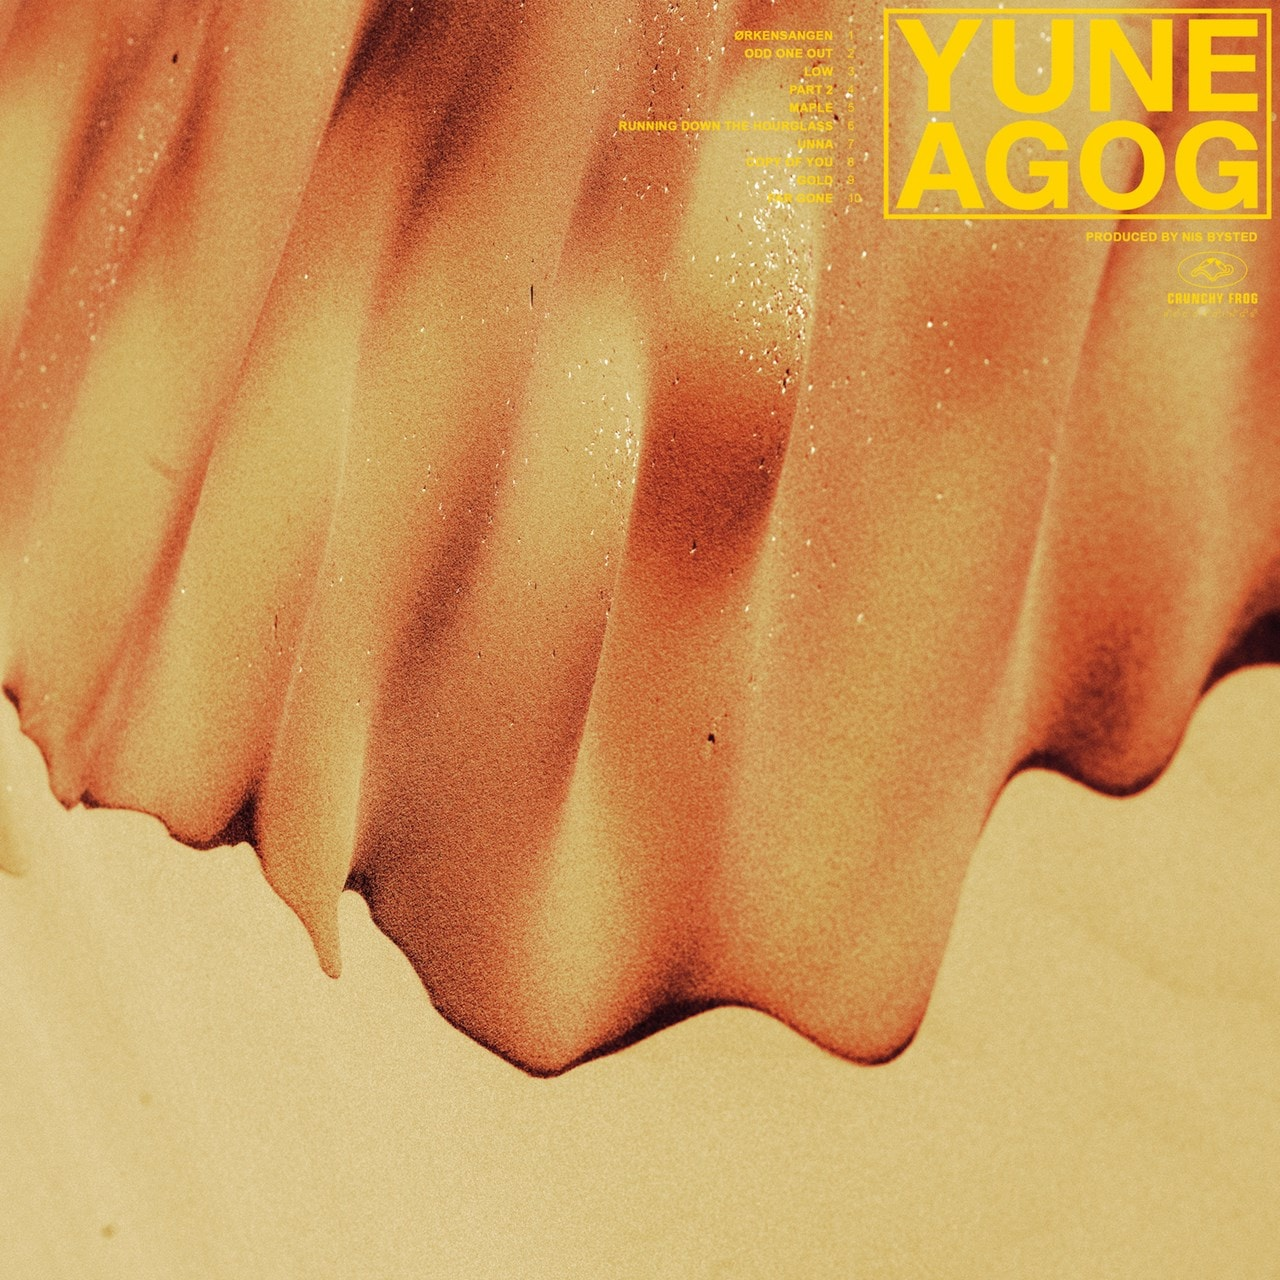 Agog - Yune - Musik - CRUNCHY FROG - 7332181096507 - 22/5-2020